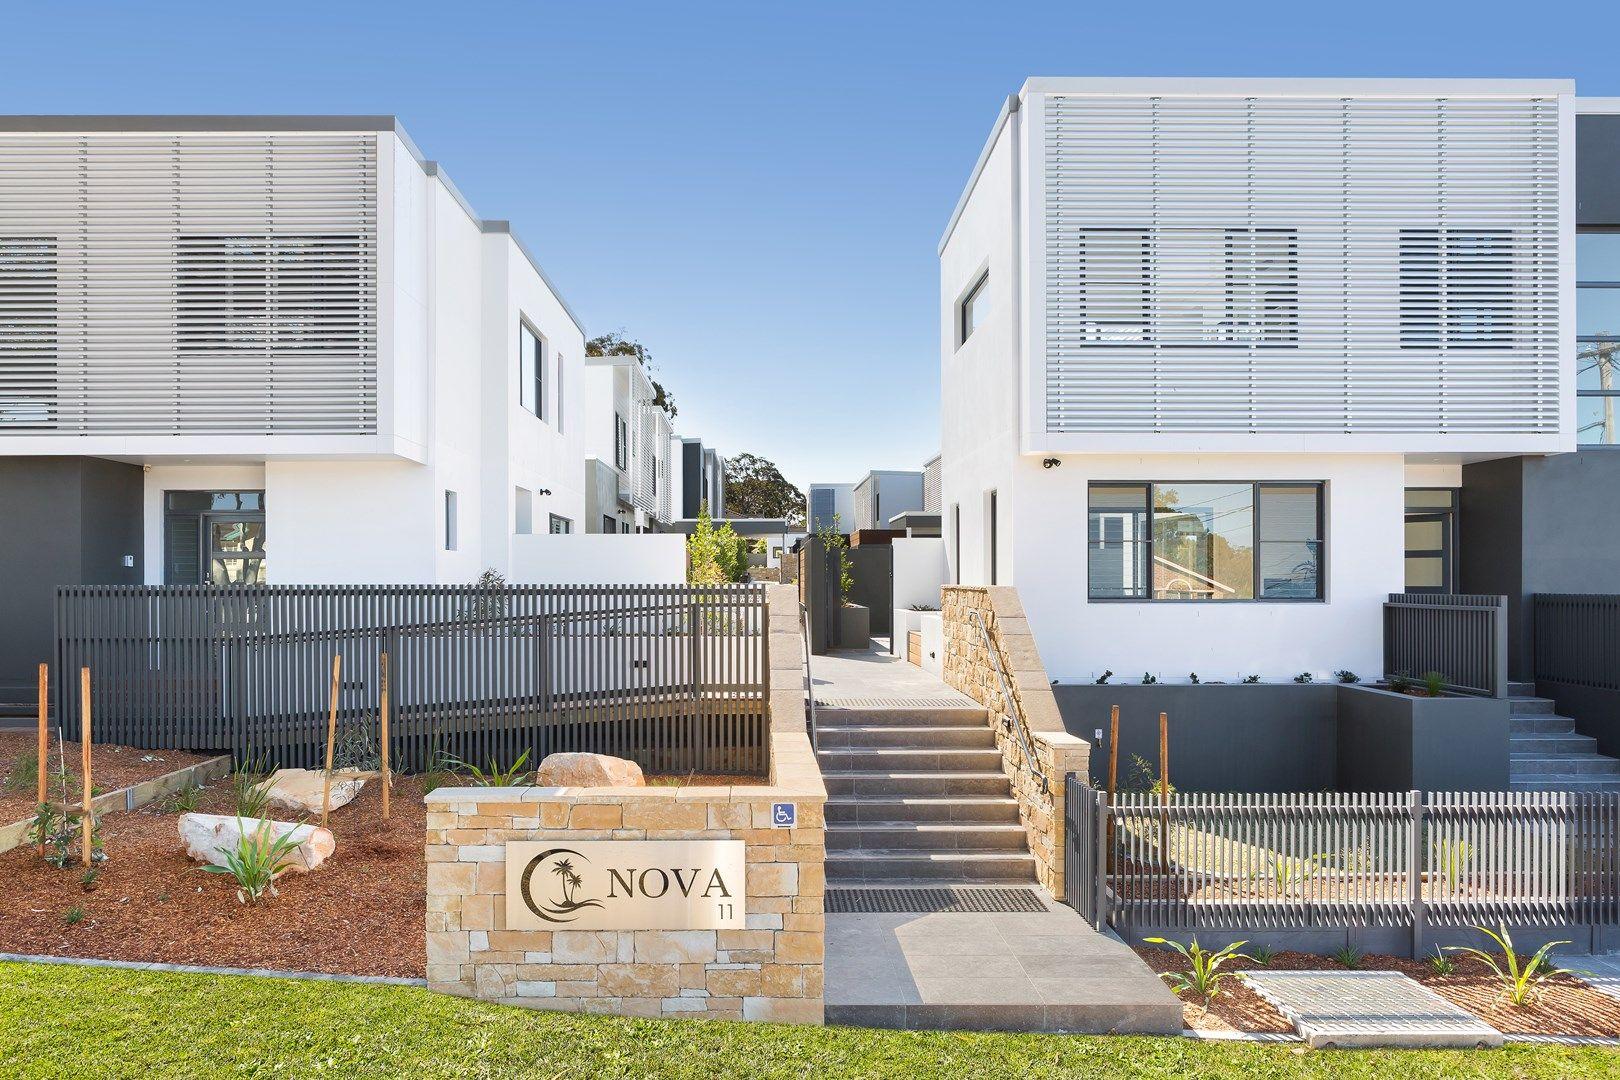 11-13 Northcote Avenue, Caringbah South NSW 2229, Image 0